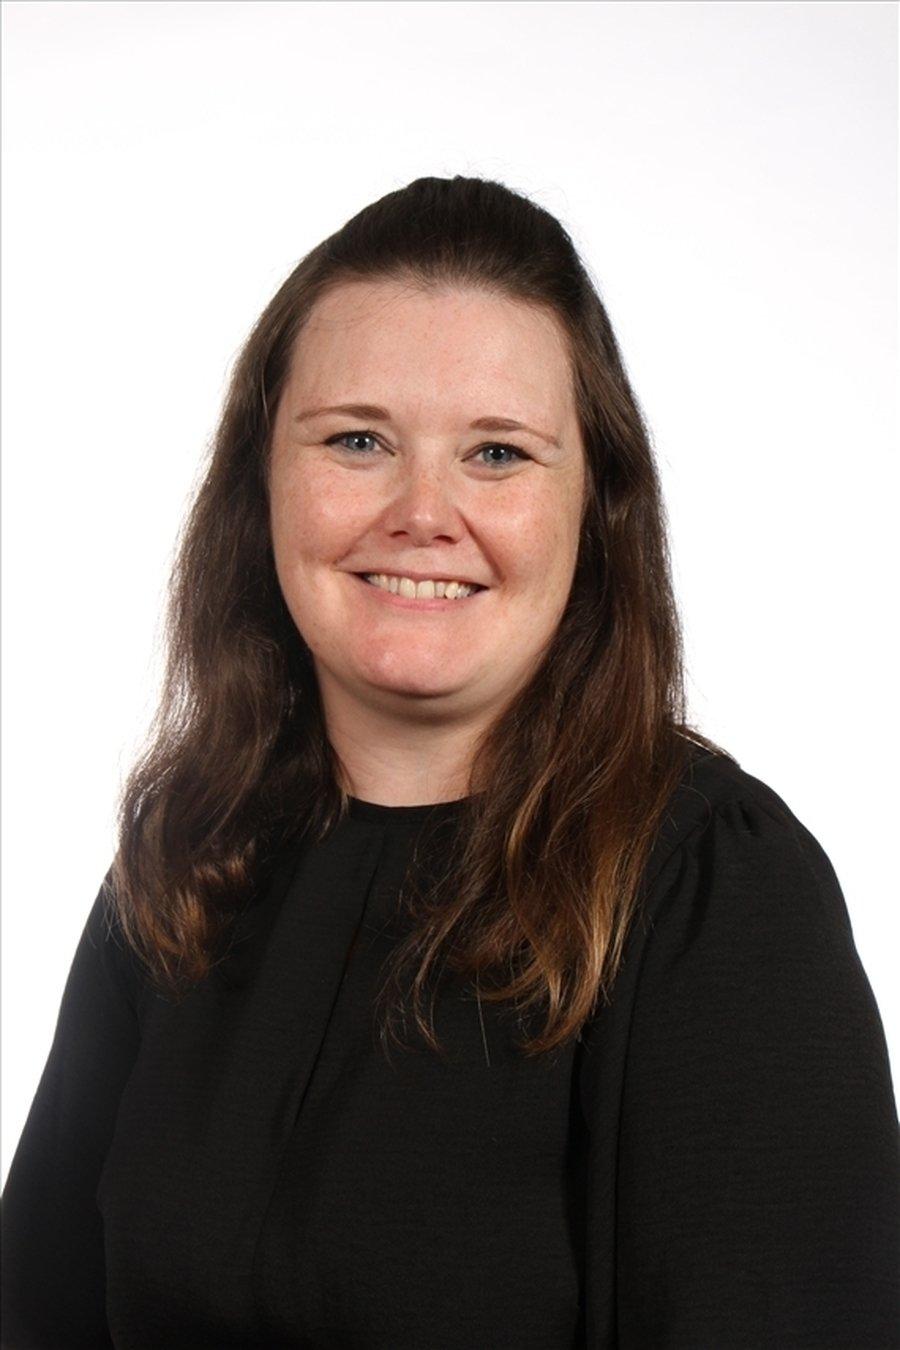 Miss Coles - Nursery PM